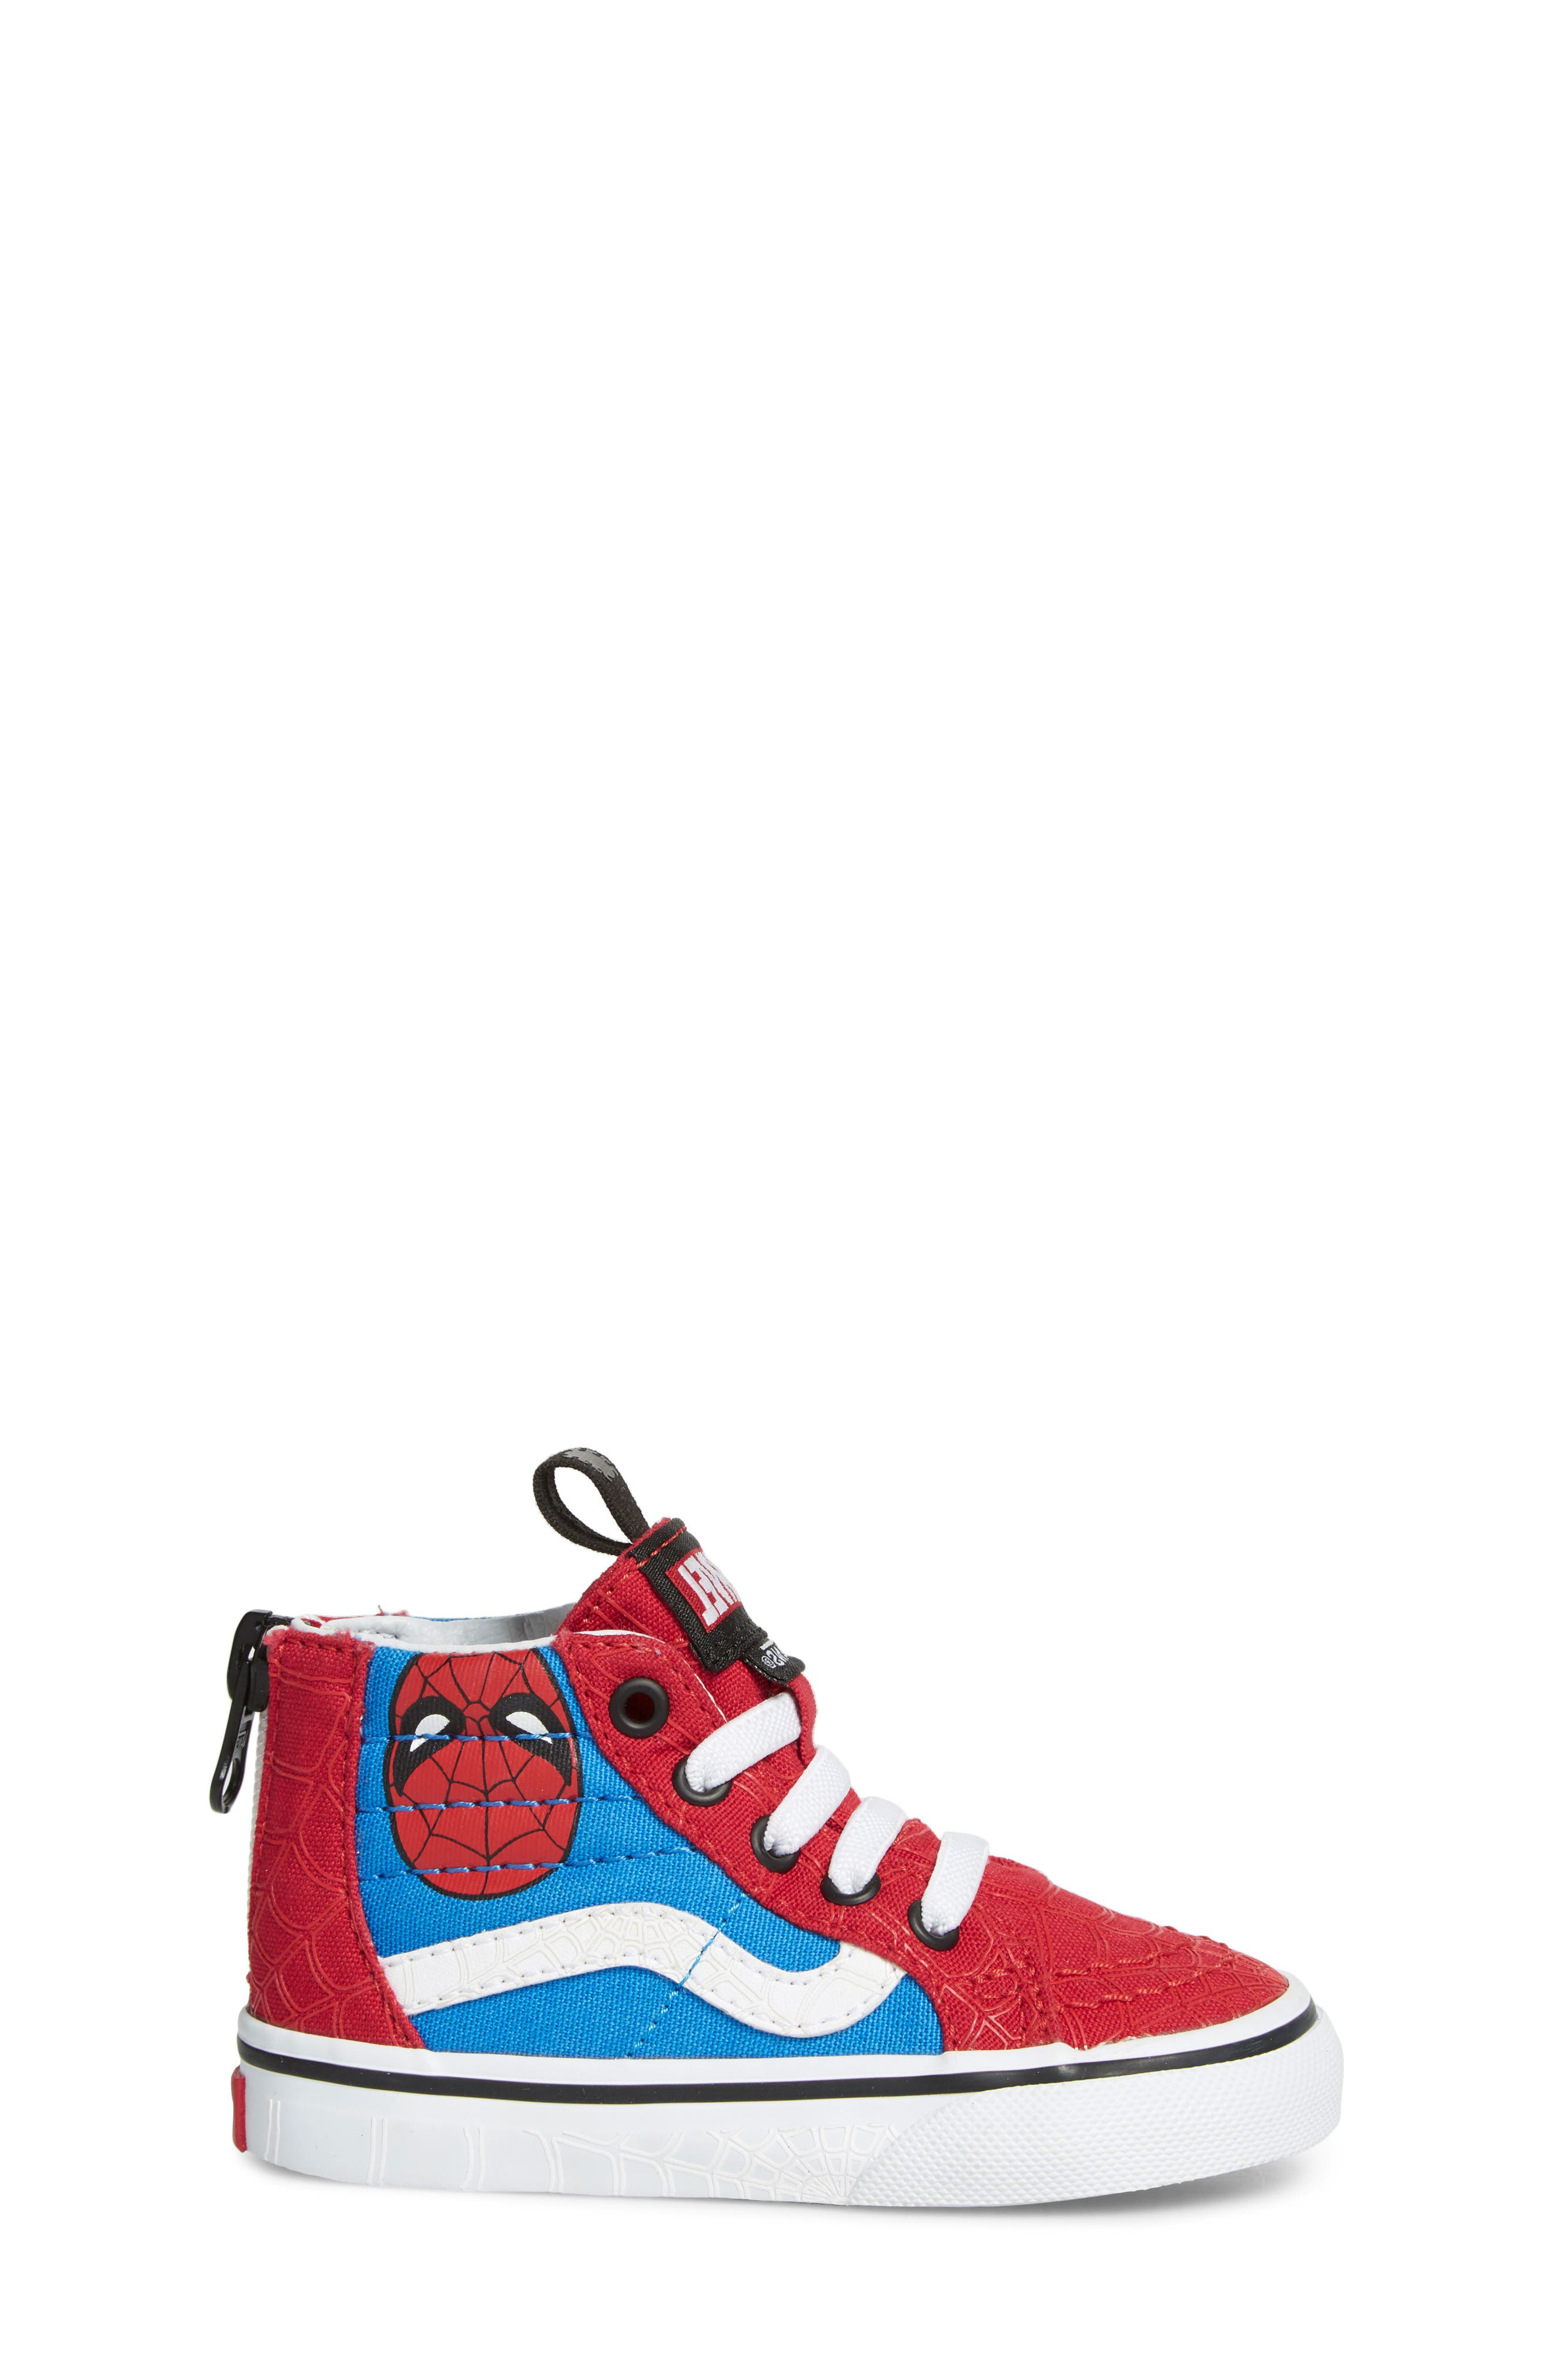 x Marvel<sup>®</sup> Spider-Man SK8-Hi Sneaker,                             Alternate thumbnail 3, color,                             610